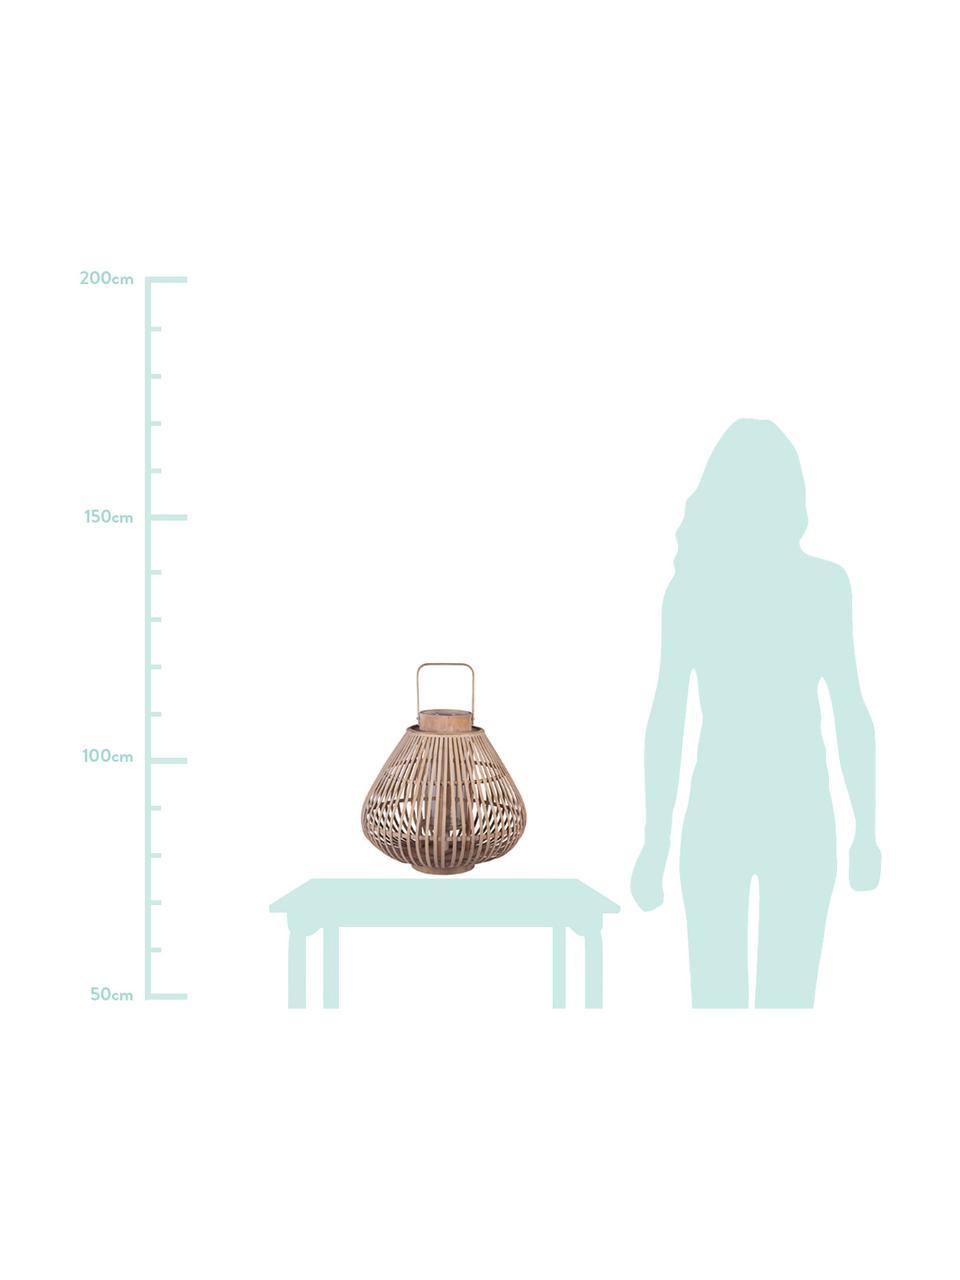 Lanterna Sahara, Bambù, Corpo: legno di bambù<br>Inserto in vetro: trasparente, Ø 32 x Alt. 28 cm